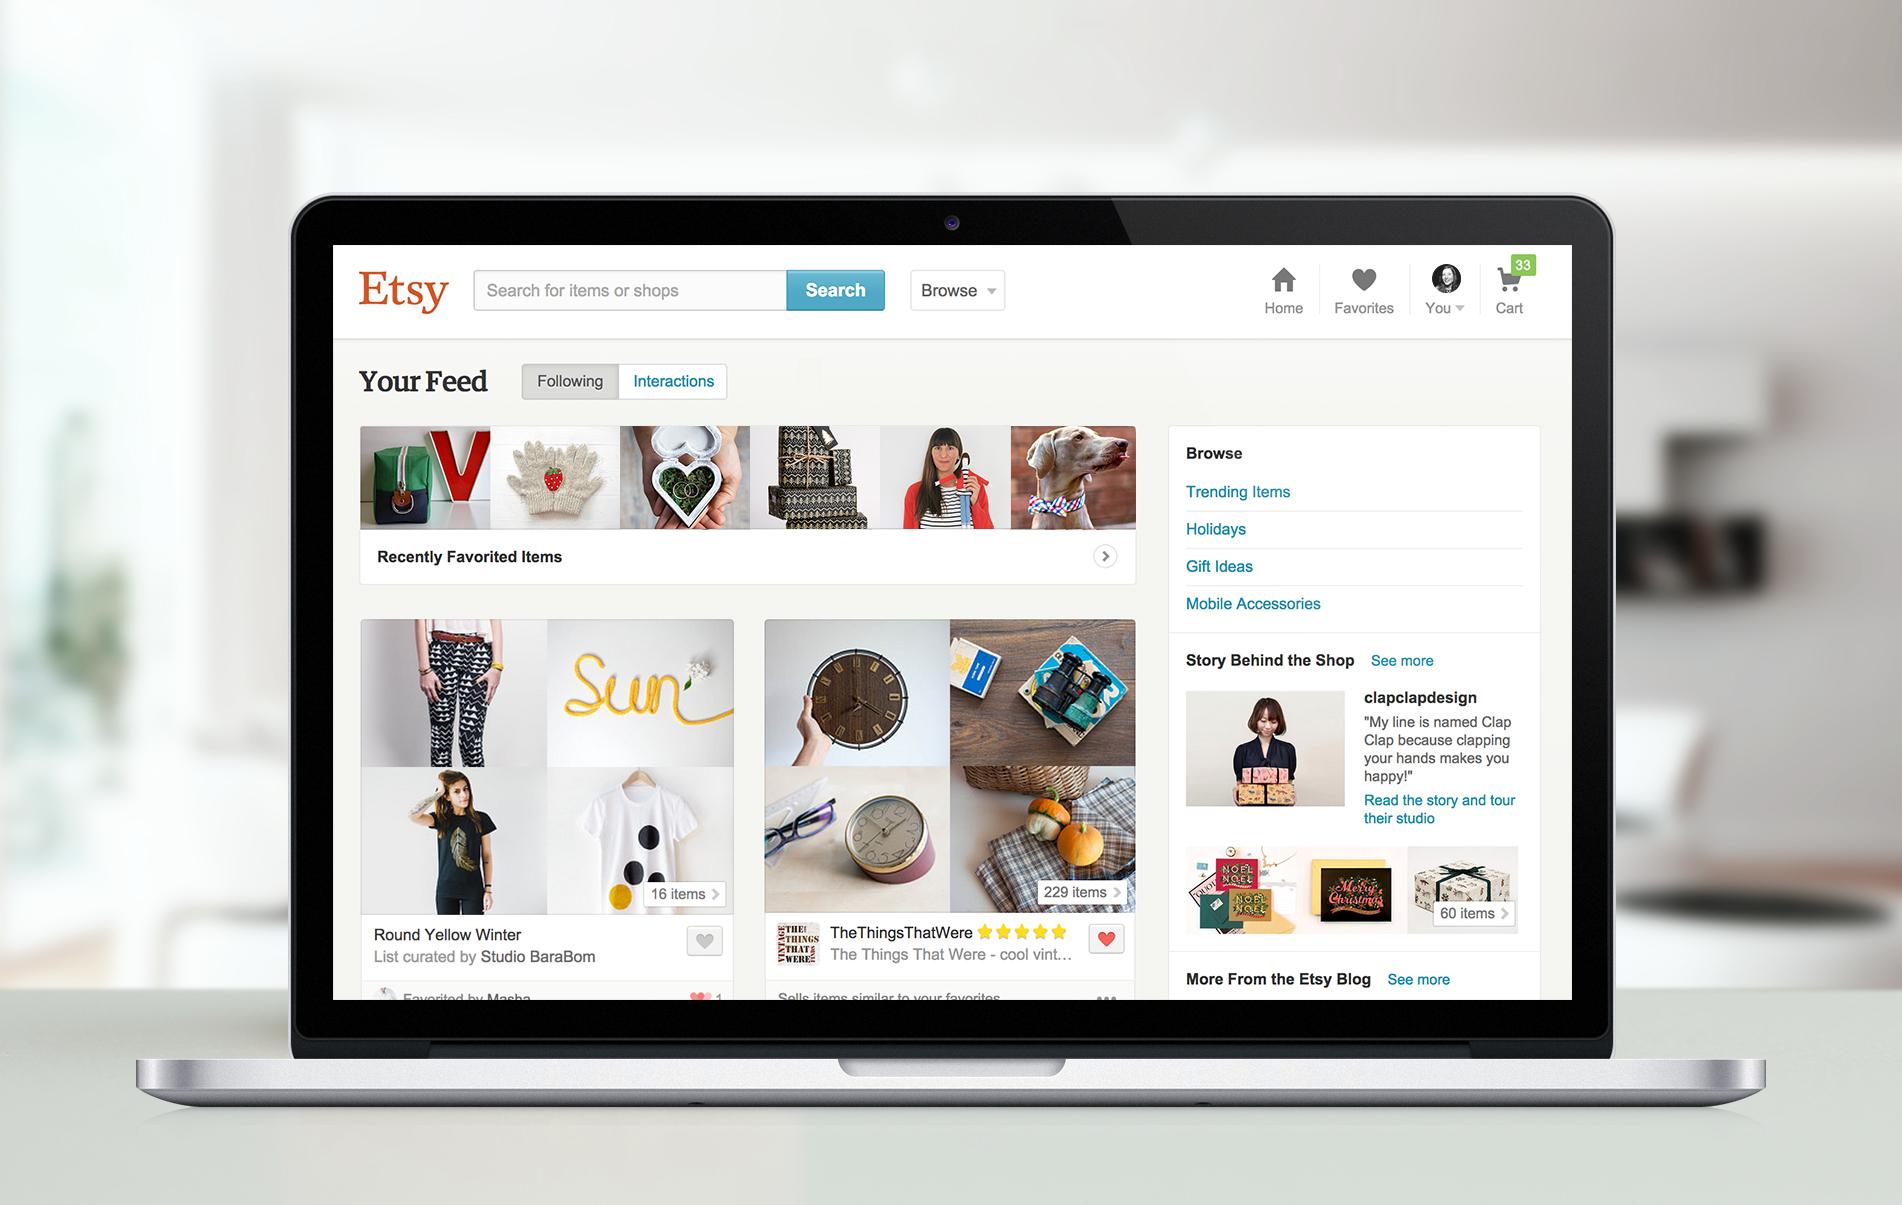 Etsy website displayed on a laptop